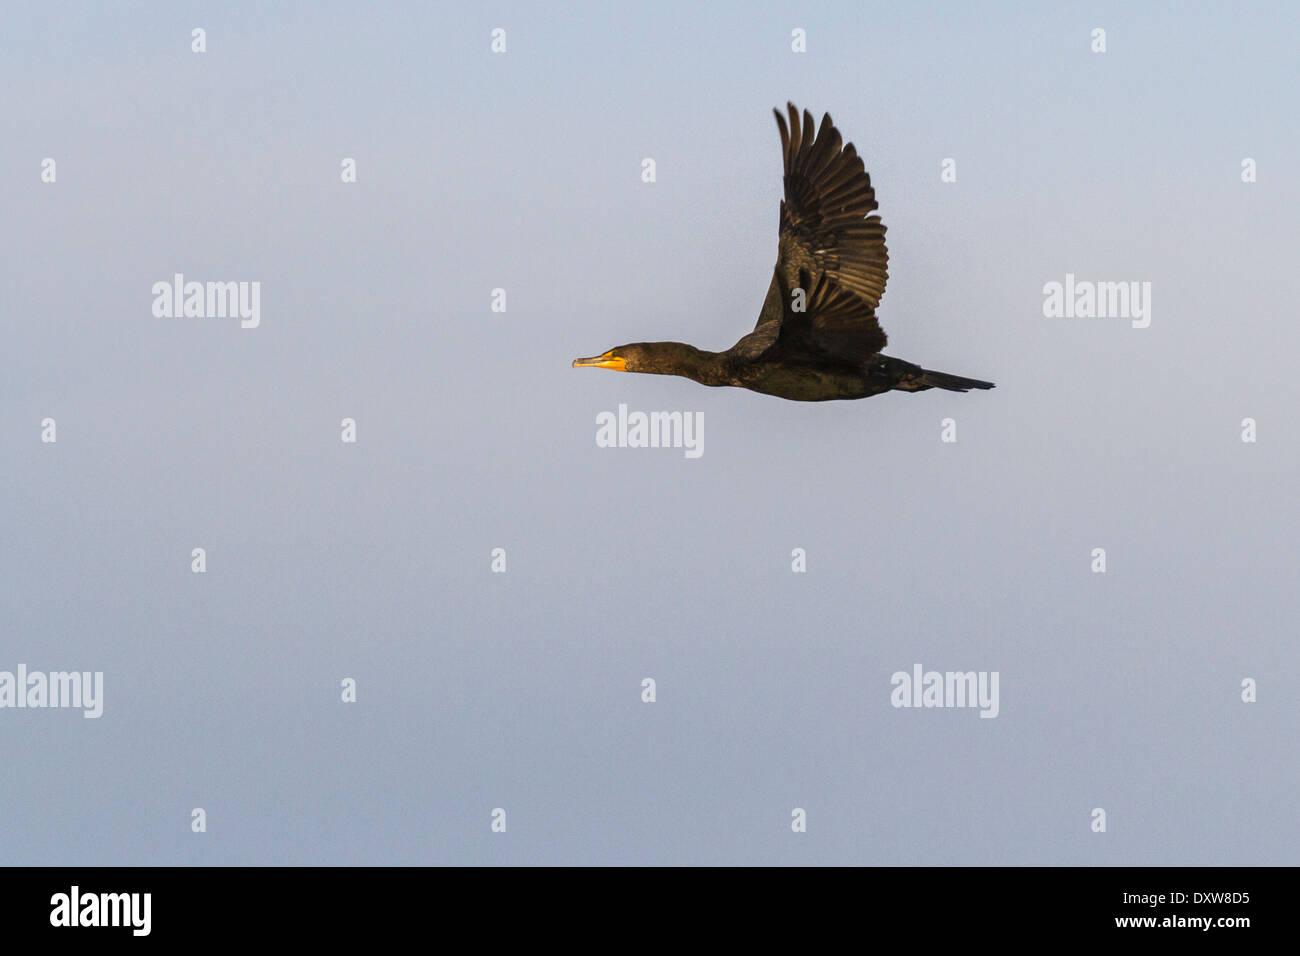 Double-crested Cormorant in flight at Port Aransas, Texas. - Stock Image